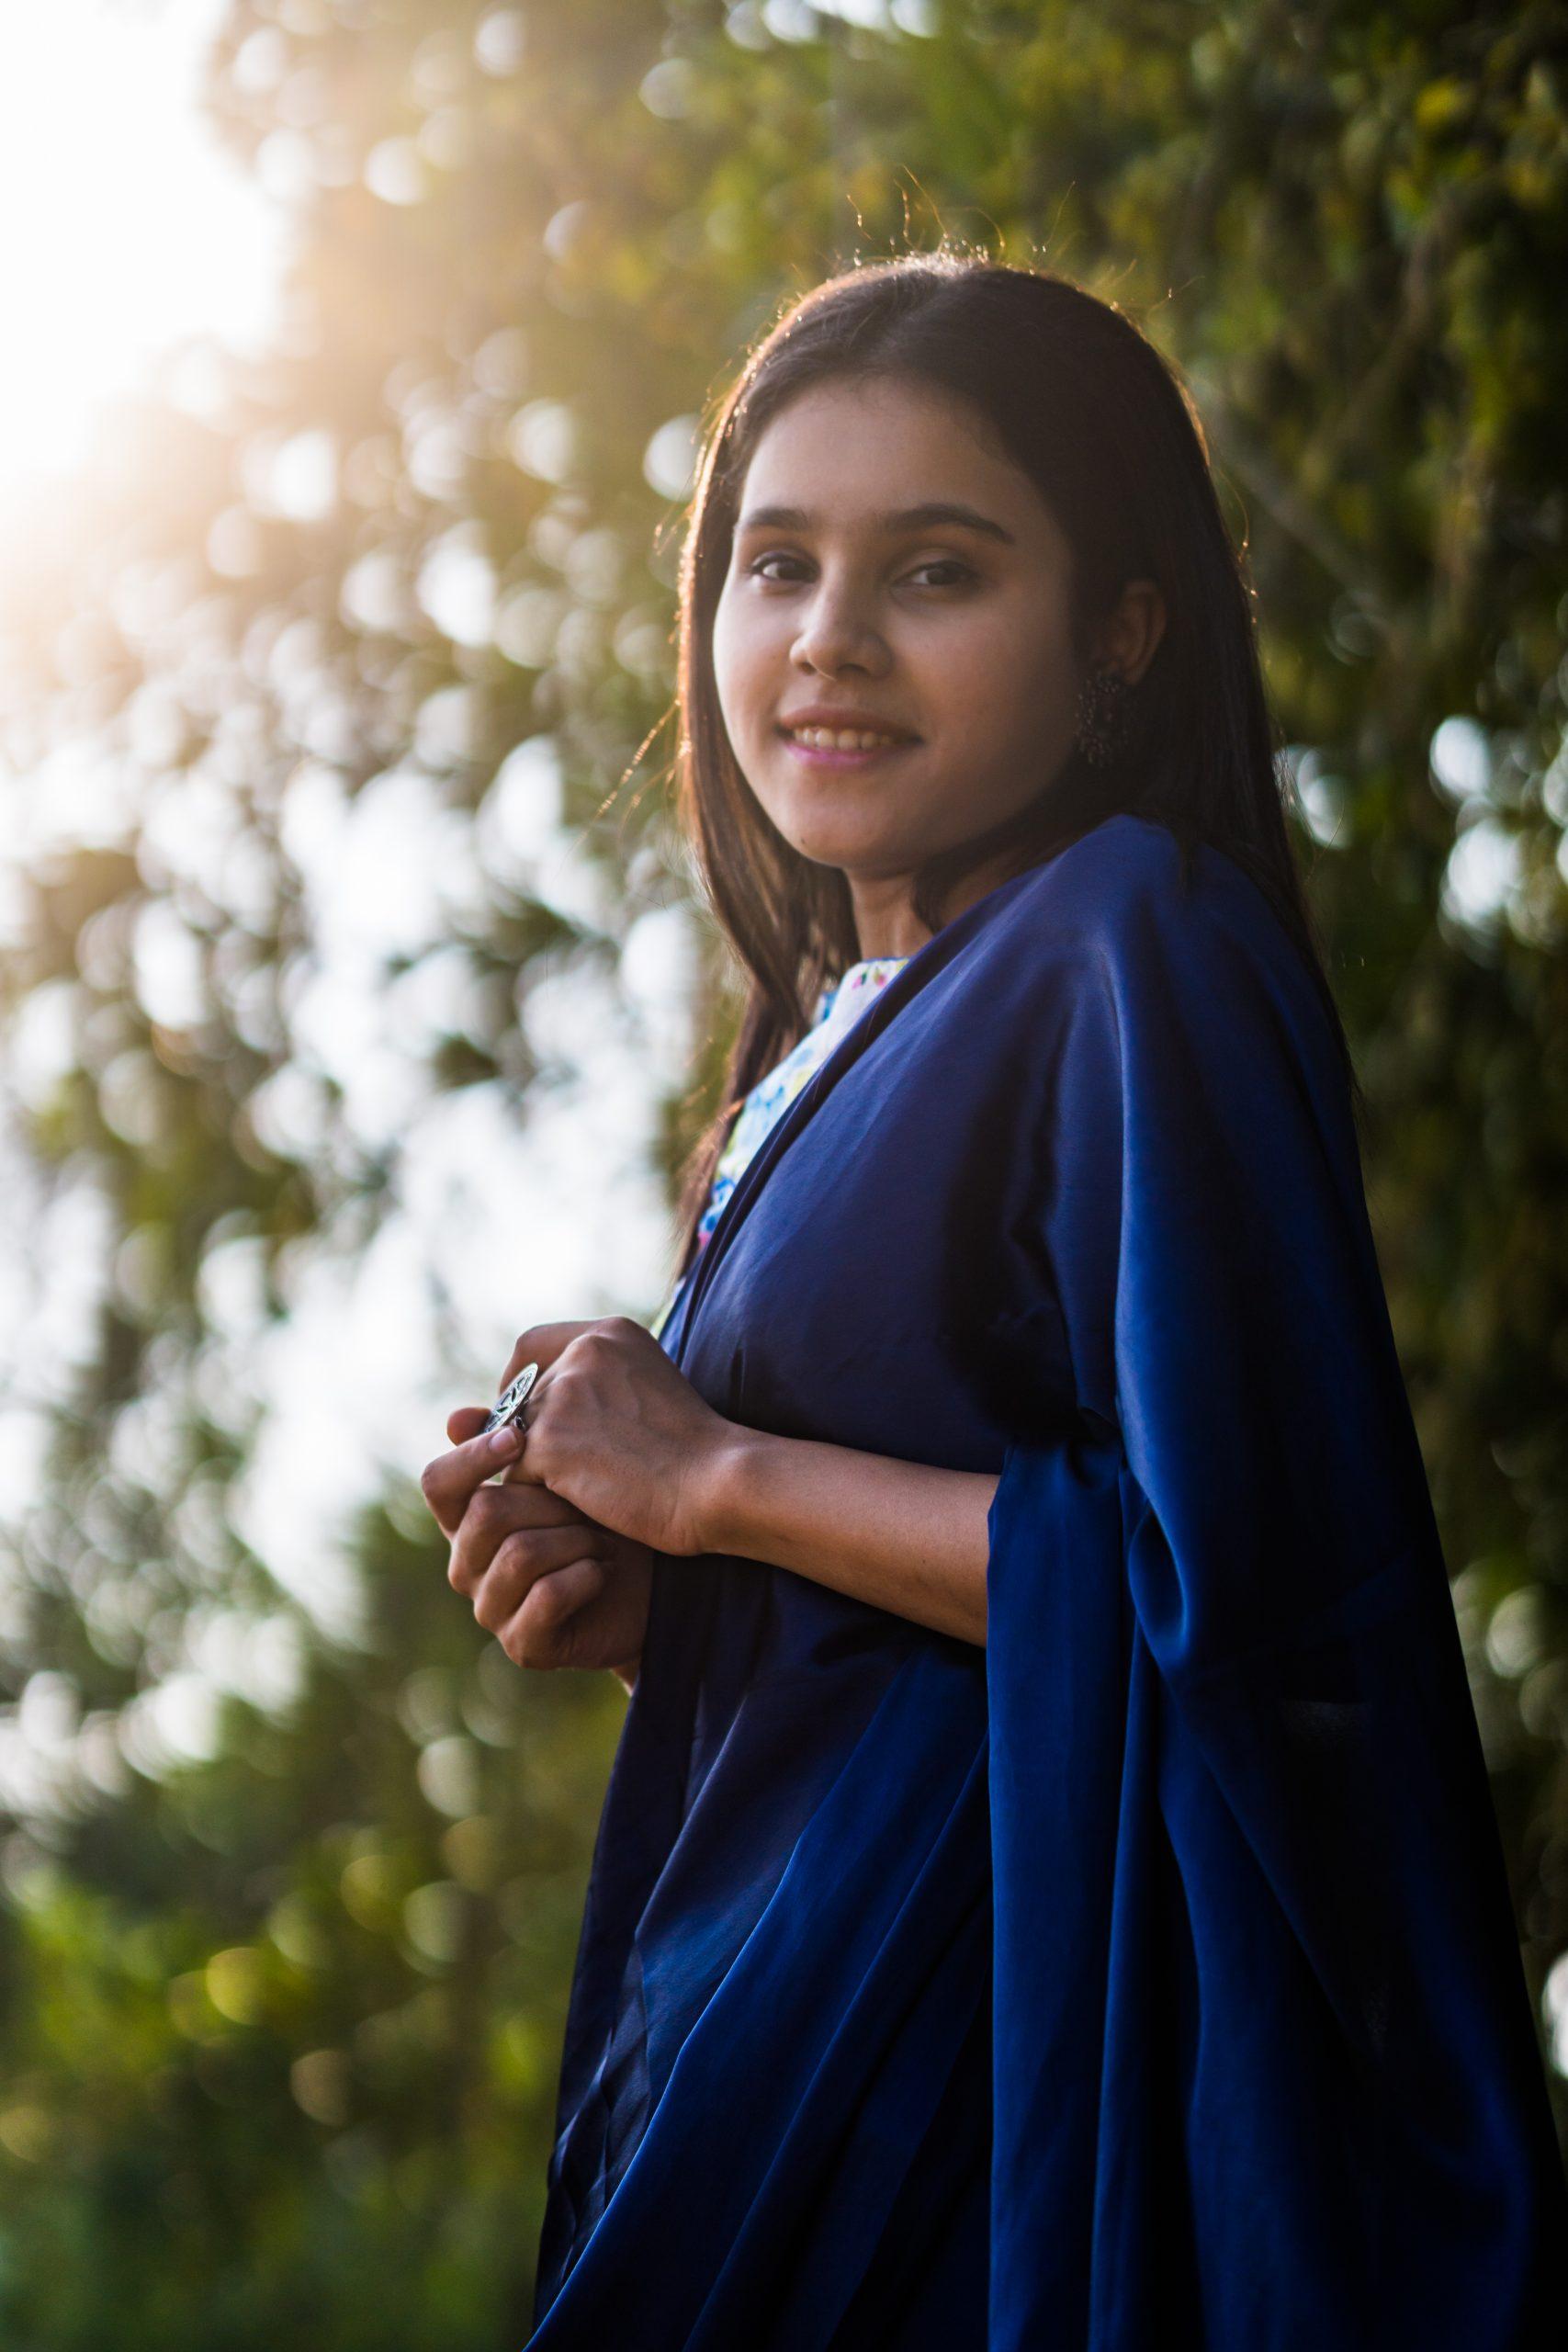 girl posing in saree